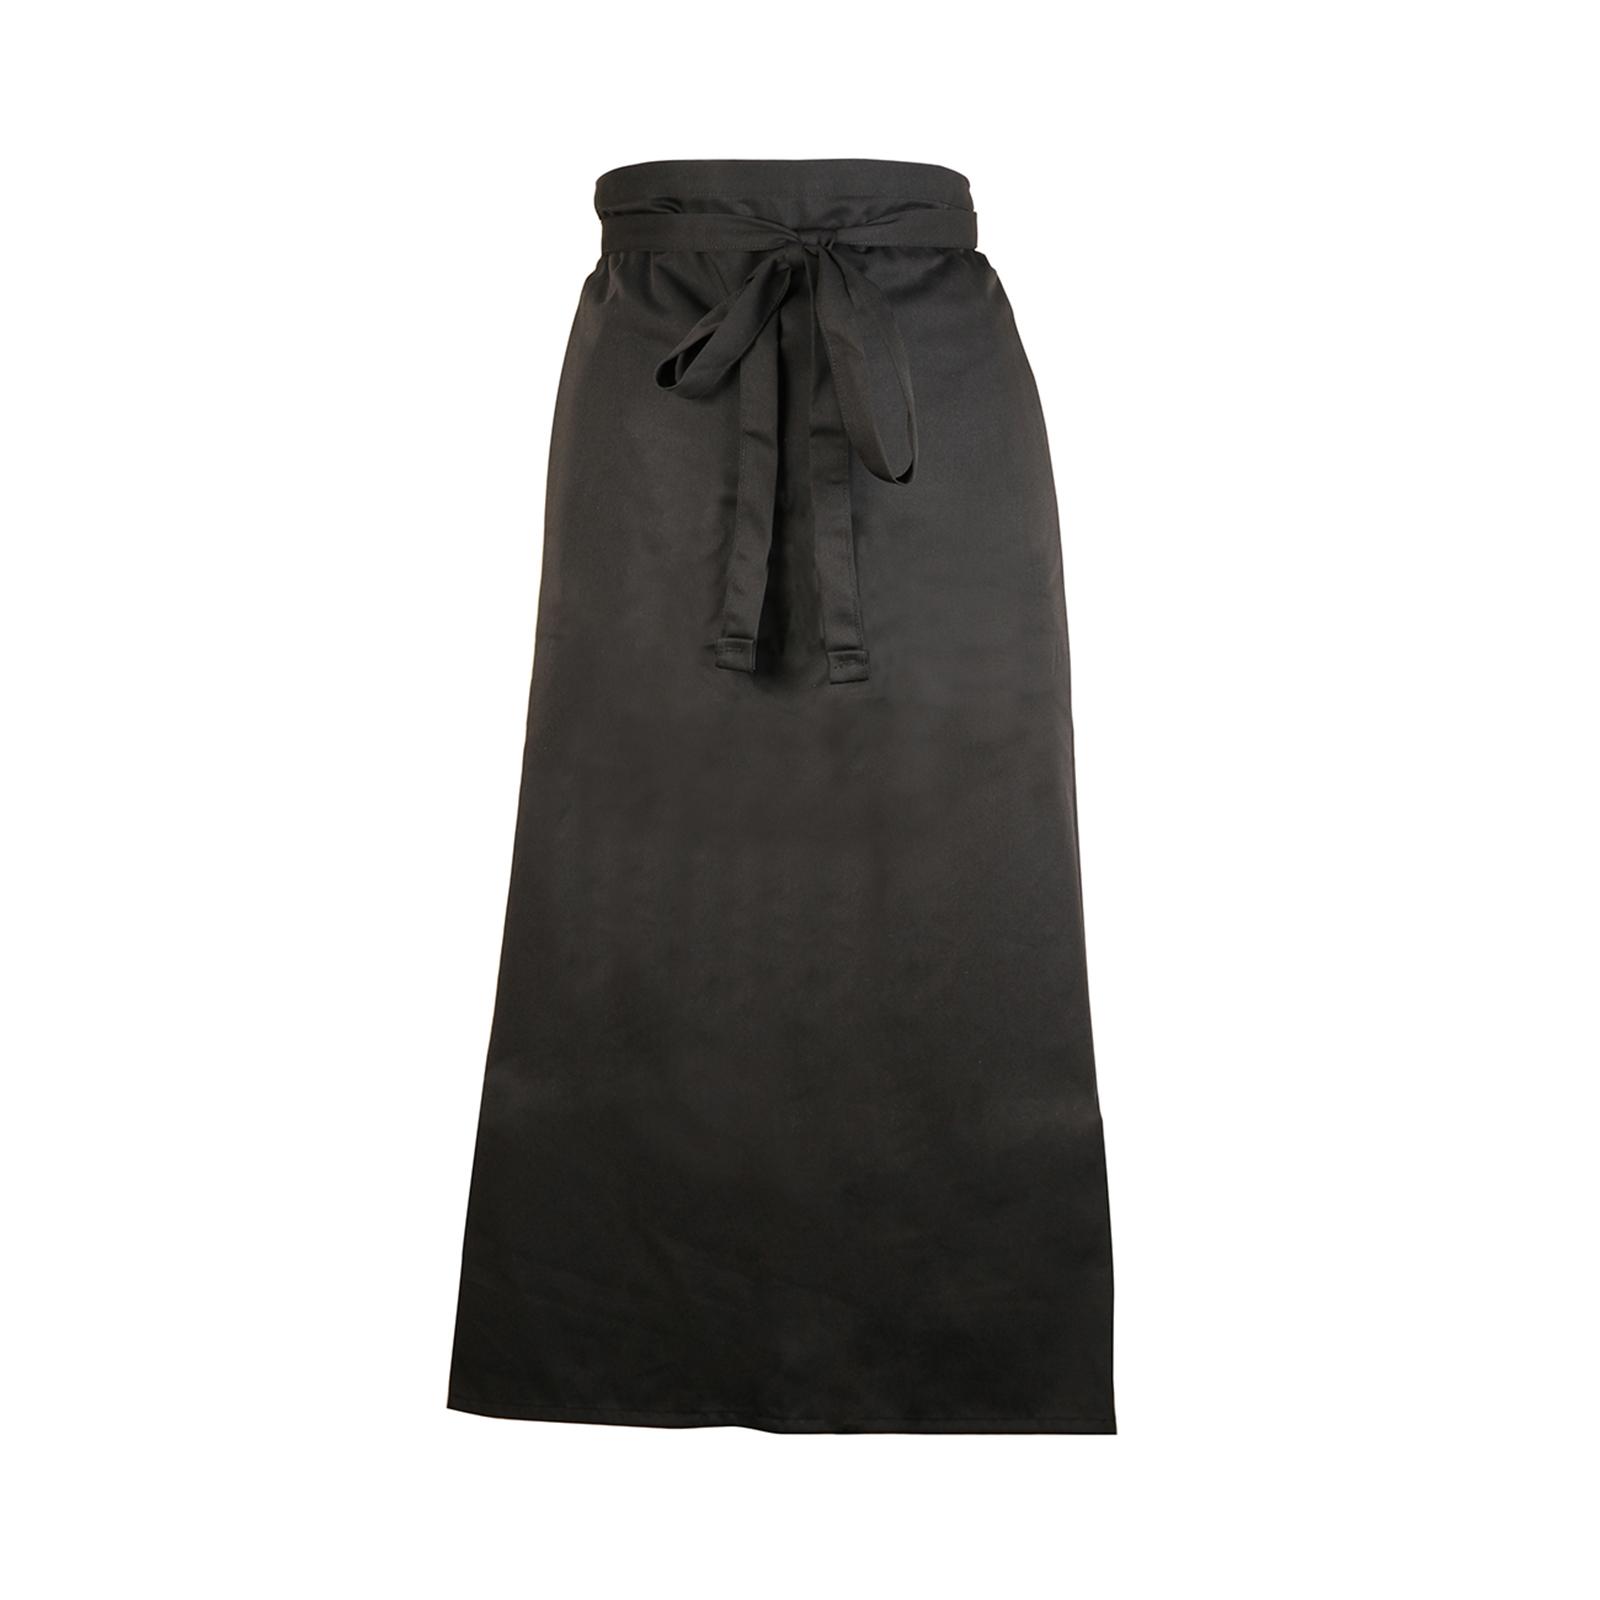 Mercer Culinary M61130BK waist apron